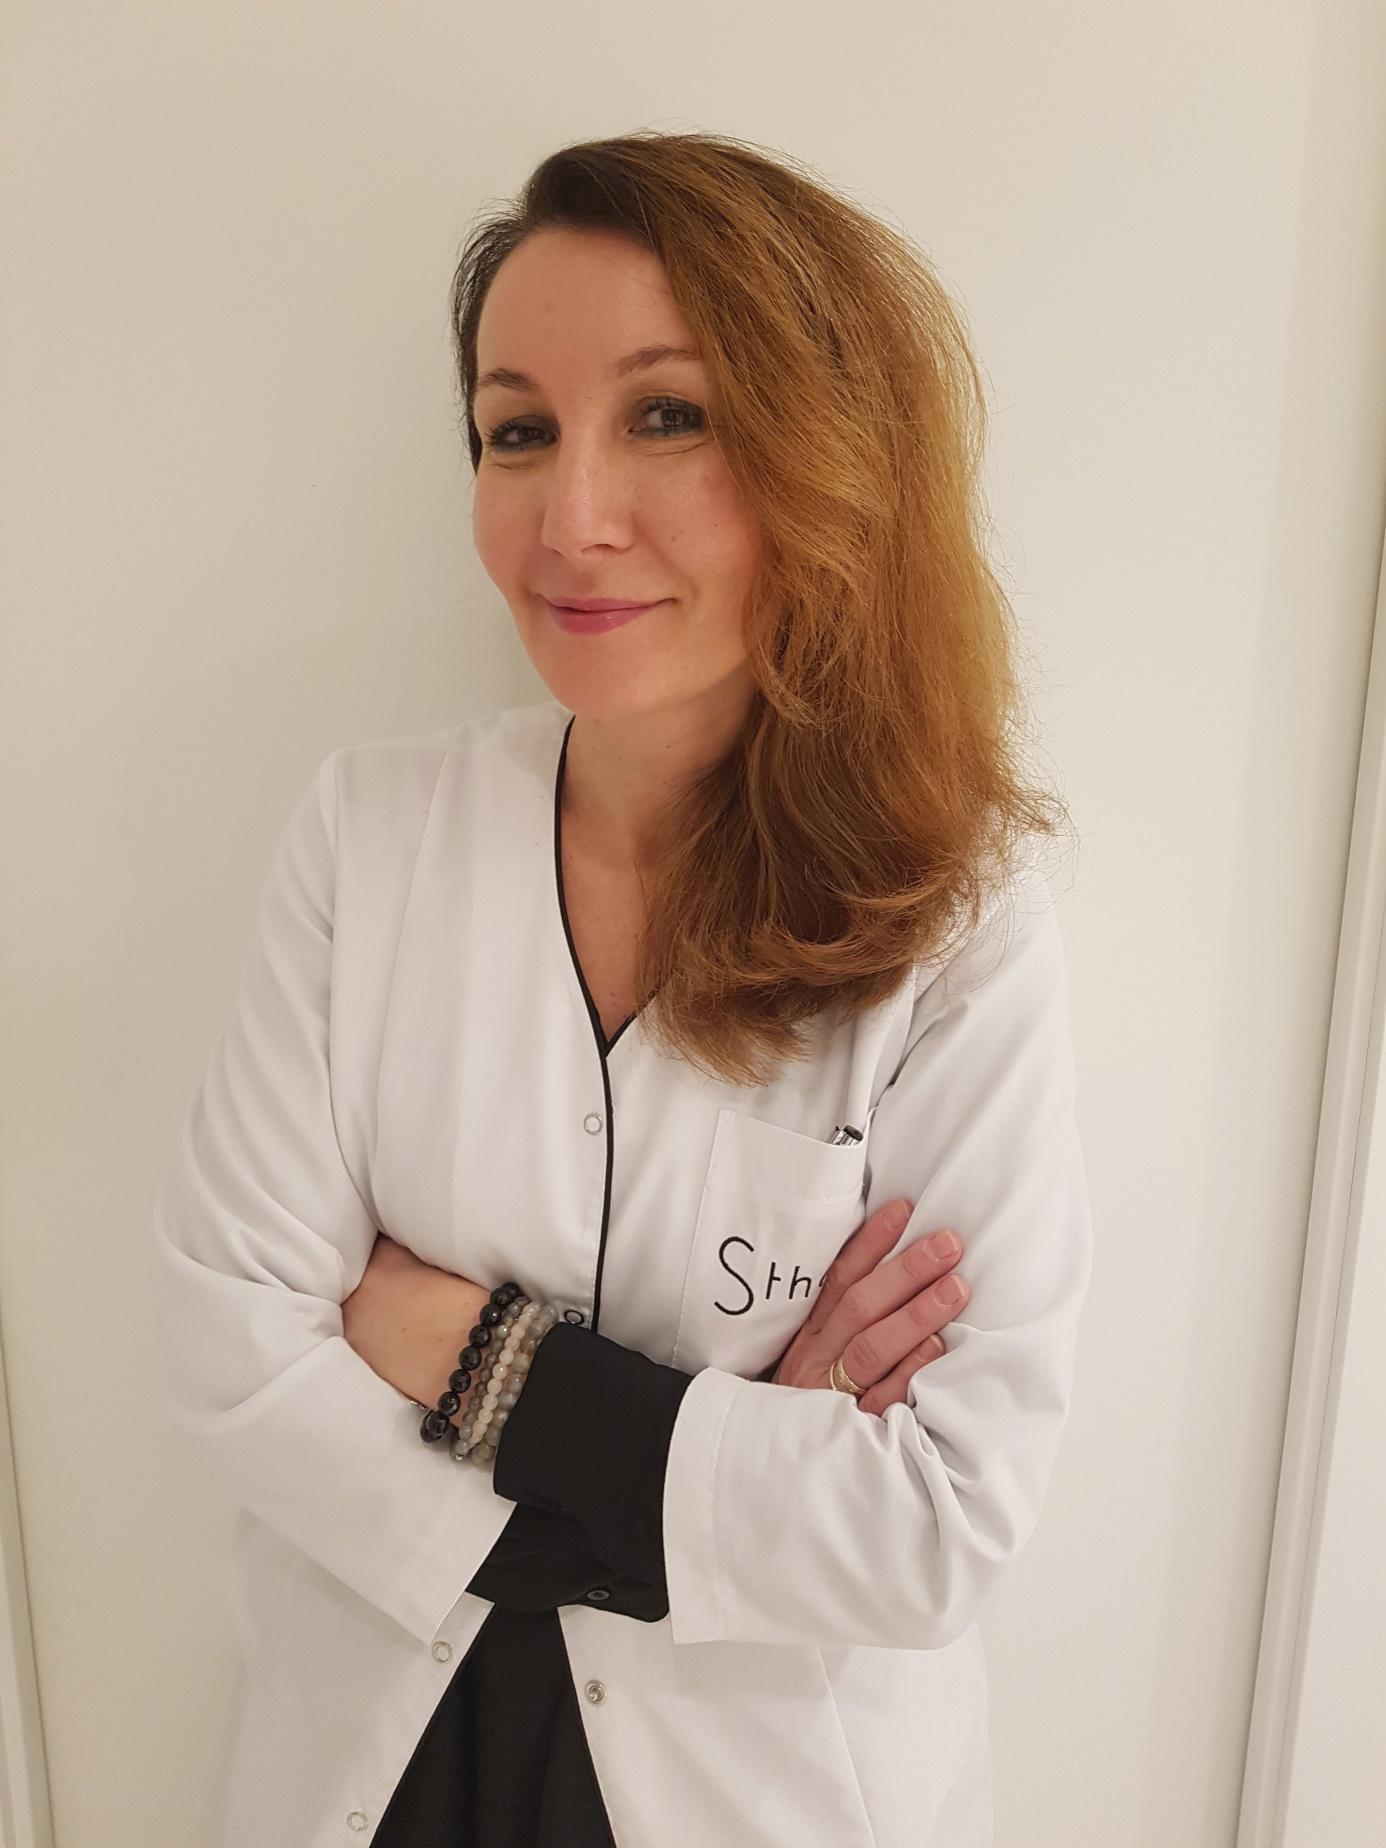 Dr Uchman